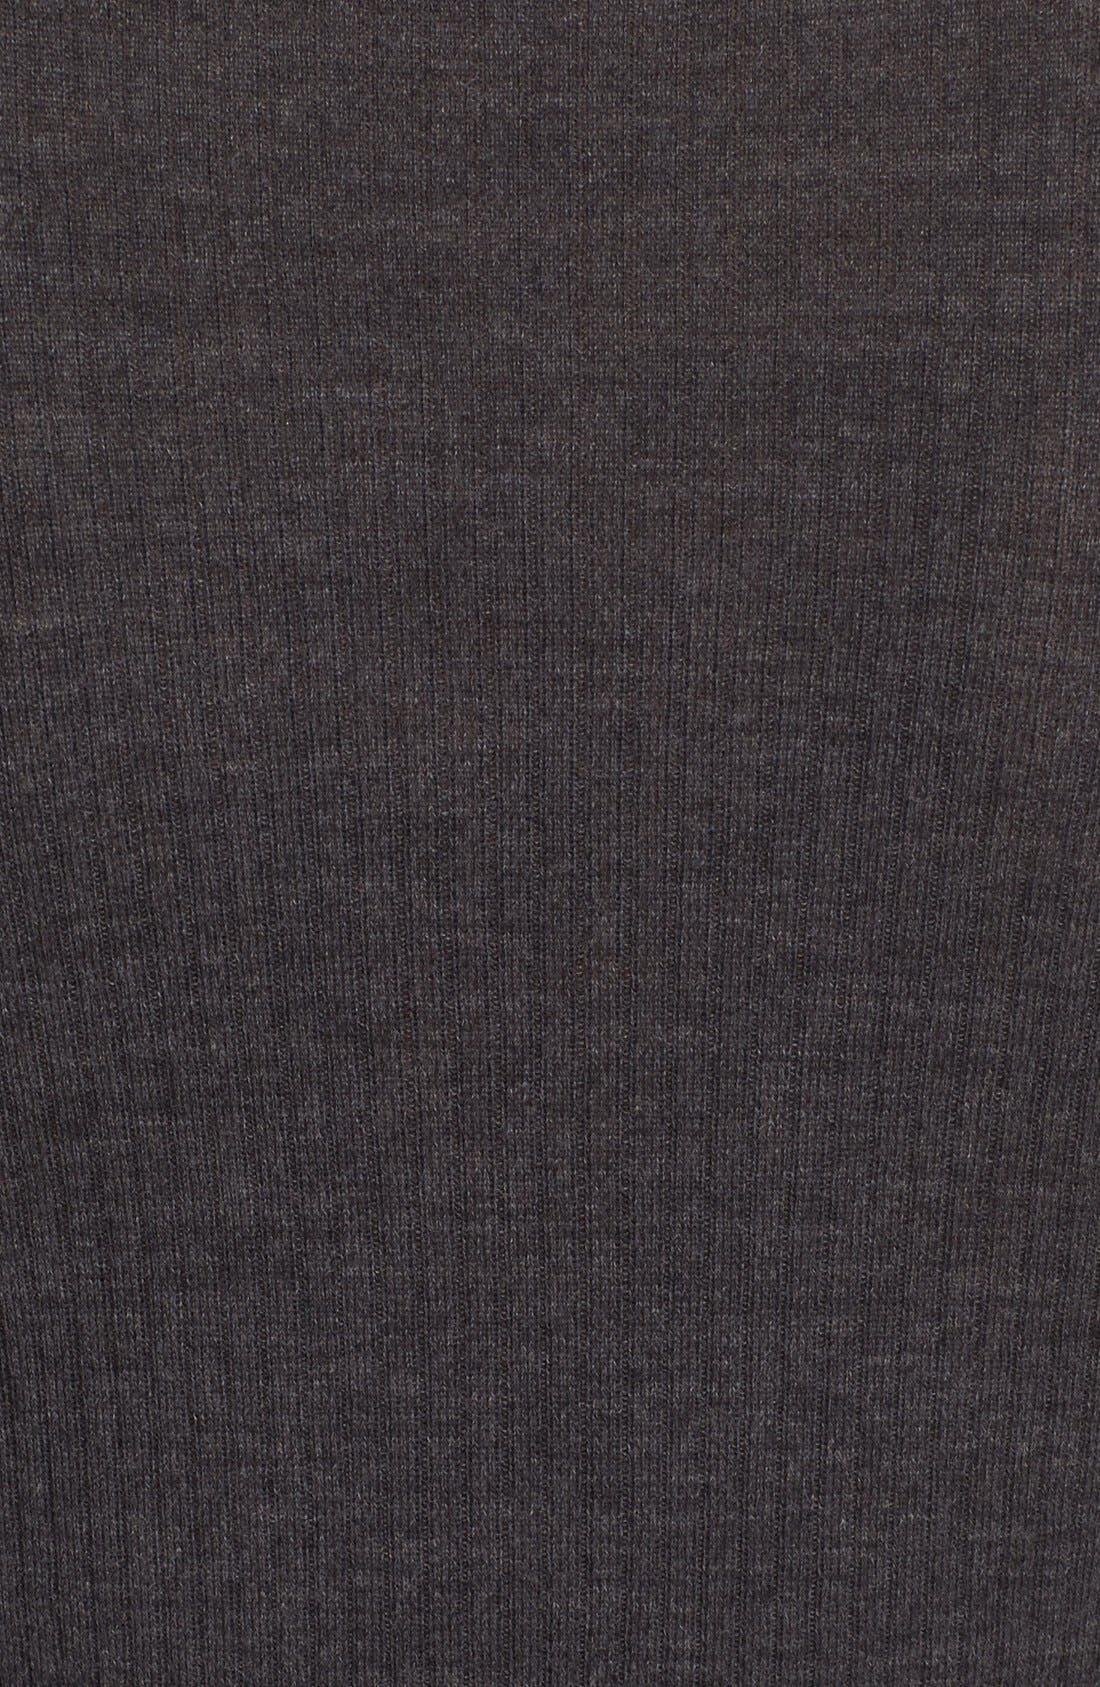 'Mirzi' Rib Knit Merino Wool Sweater,                             Alternate thumbnail 5, color,                             CHARCOAL MELANGE